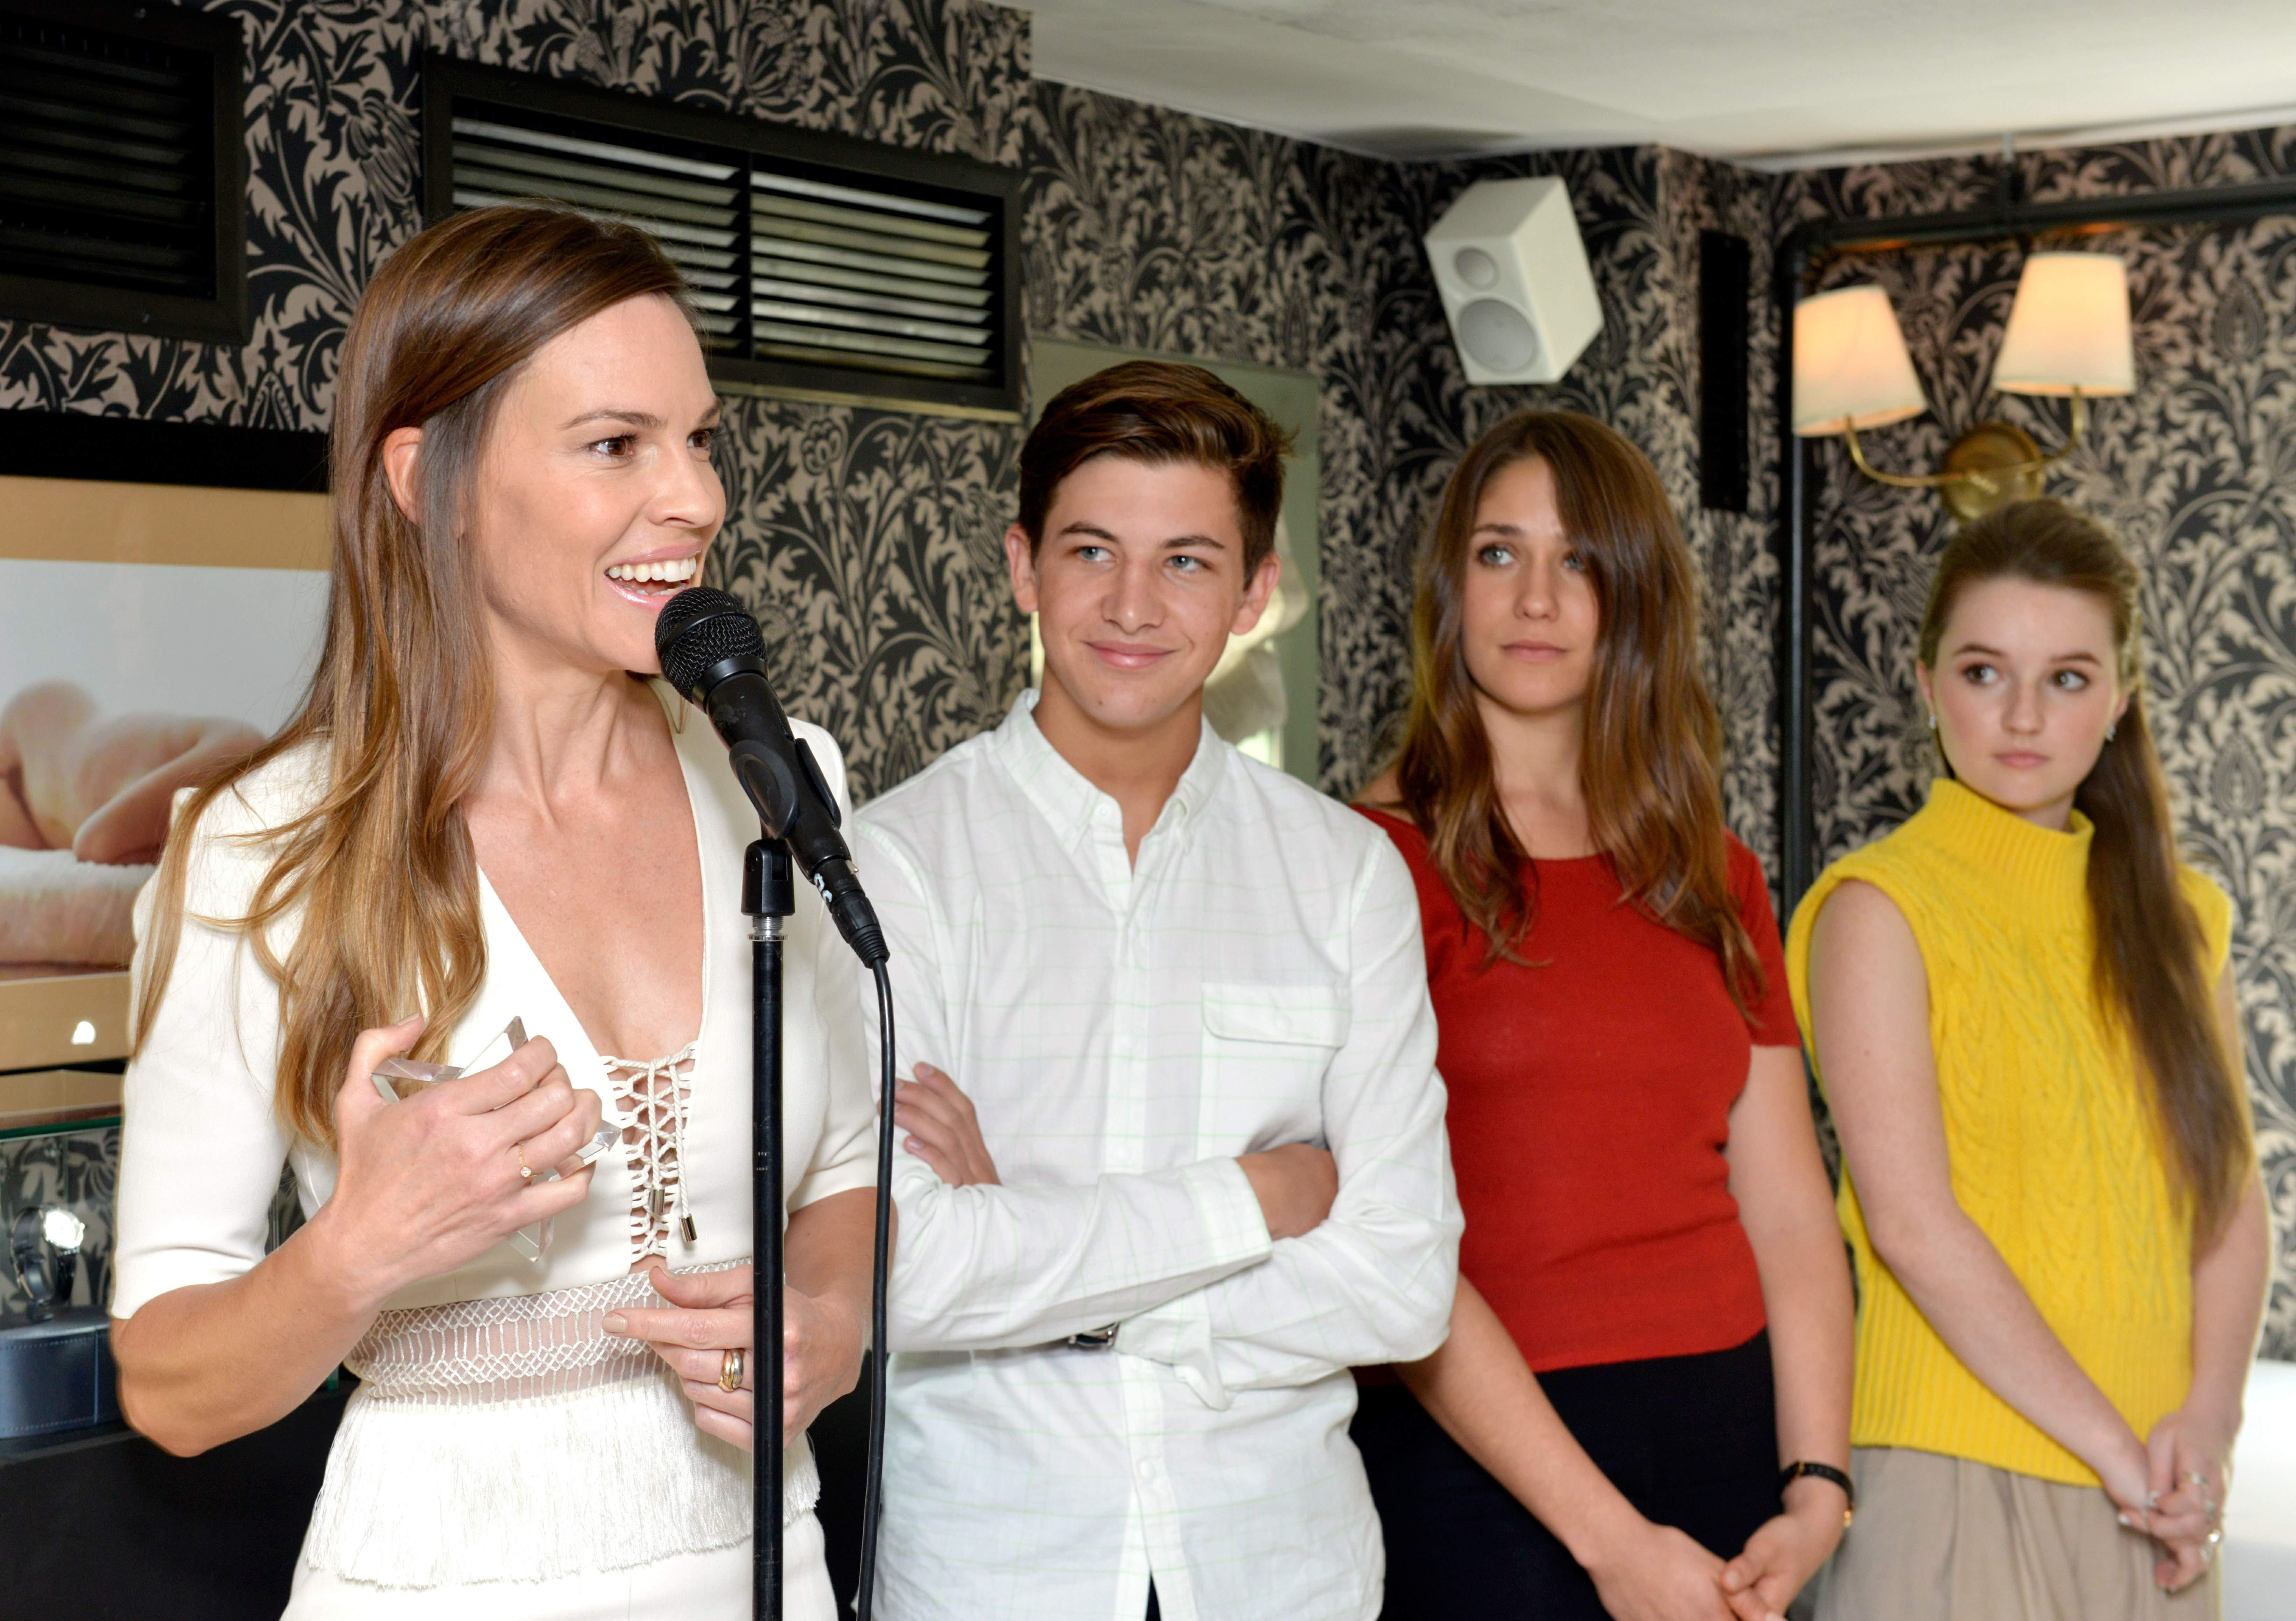 Hilary Swank - Variety's 10 Actors to Watch Brunch in East Hampton 007.jpg